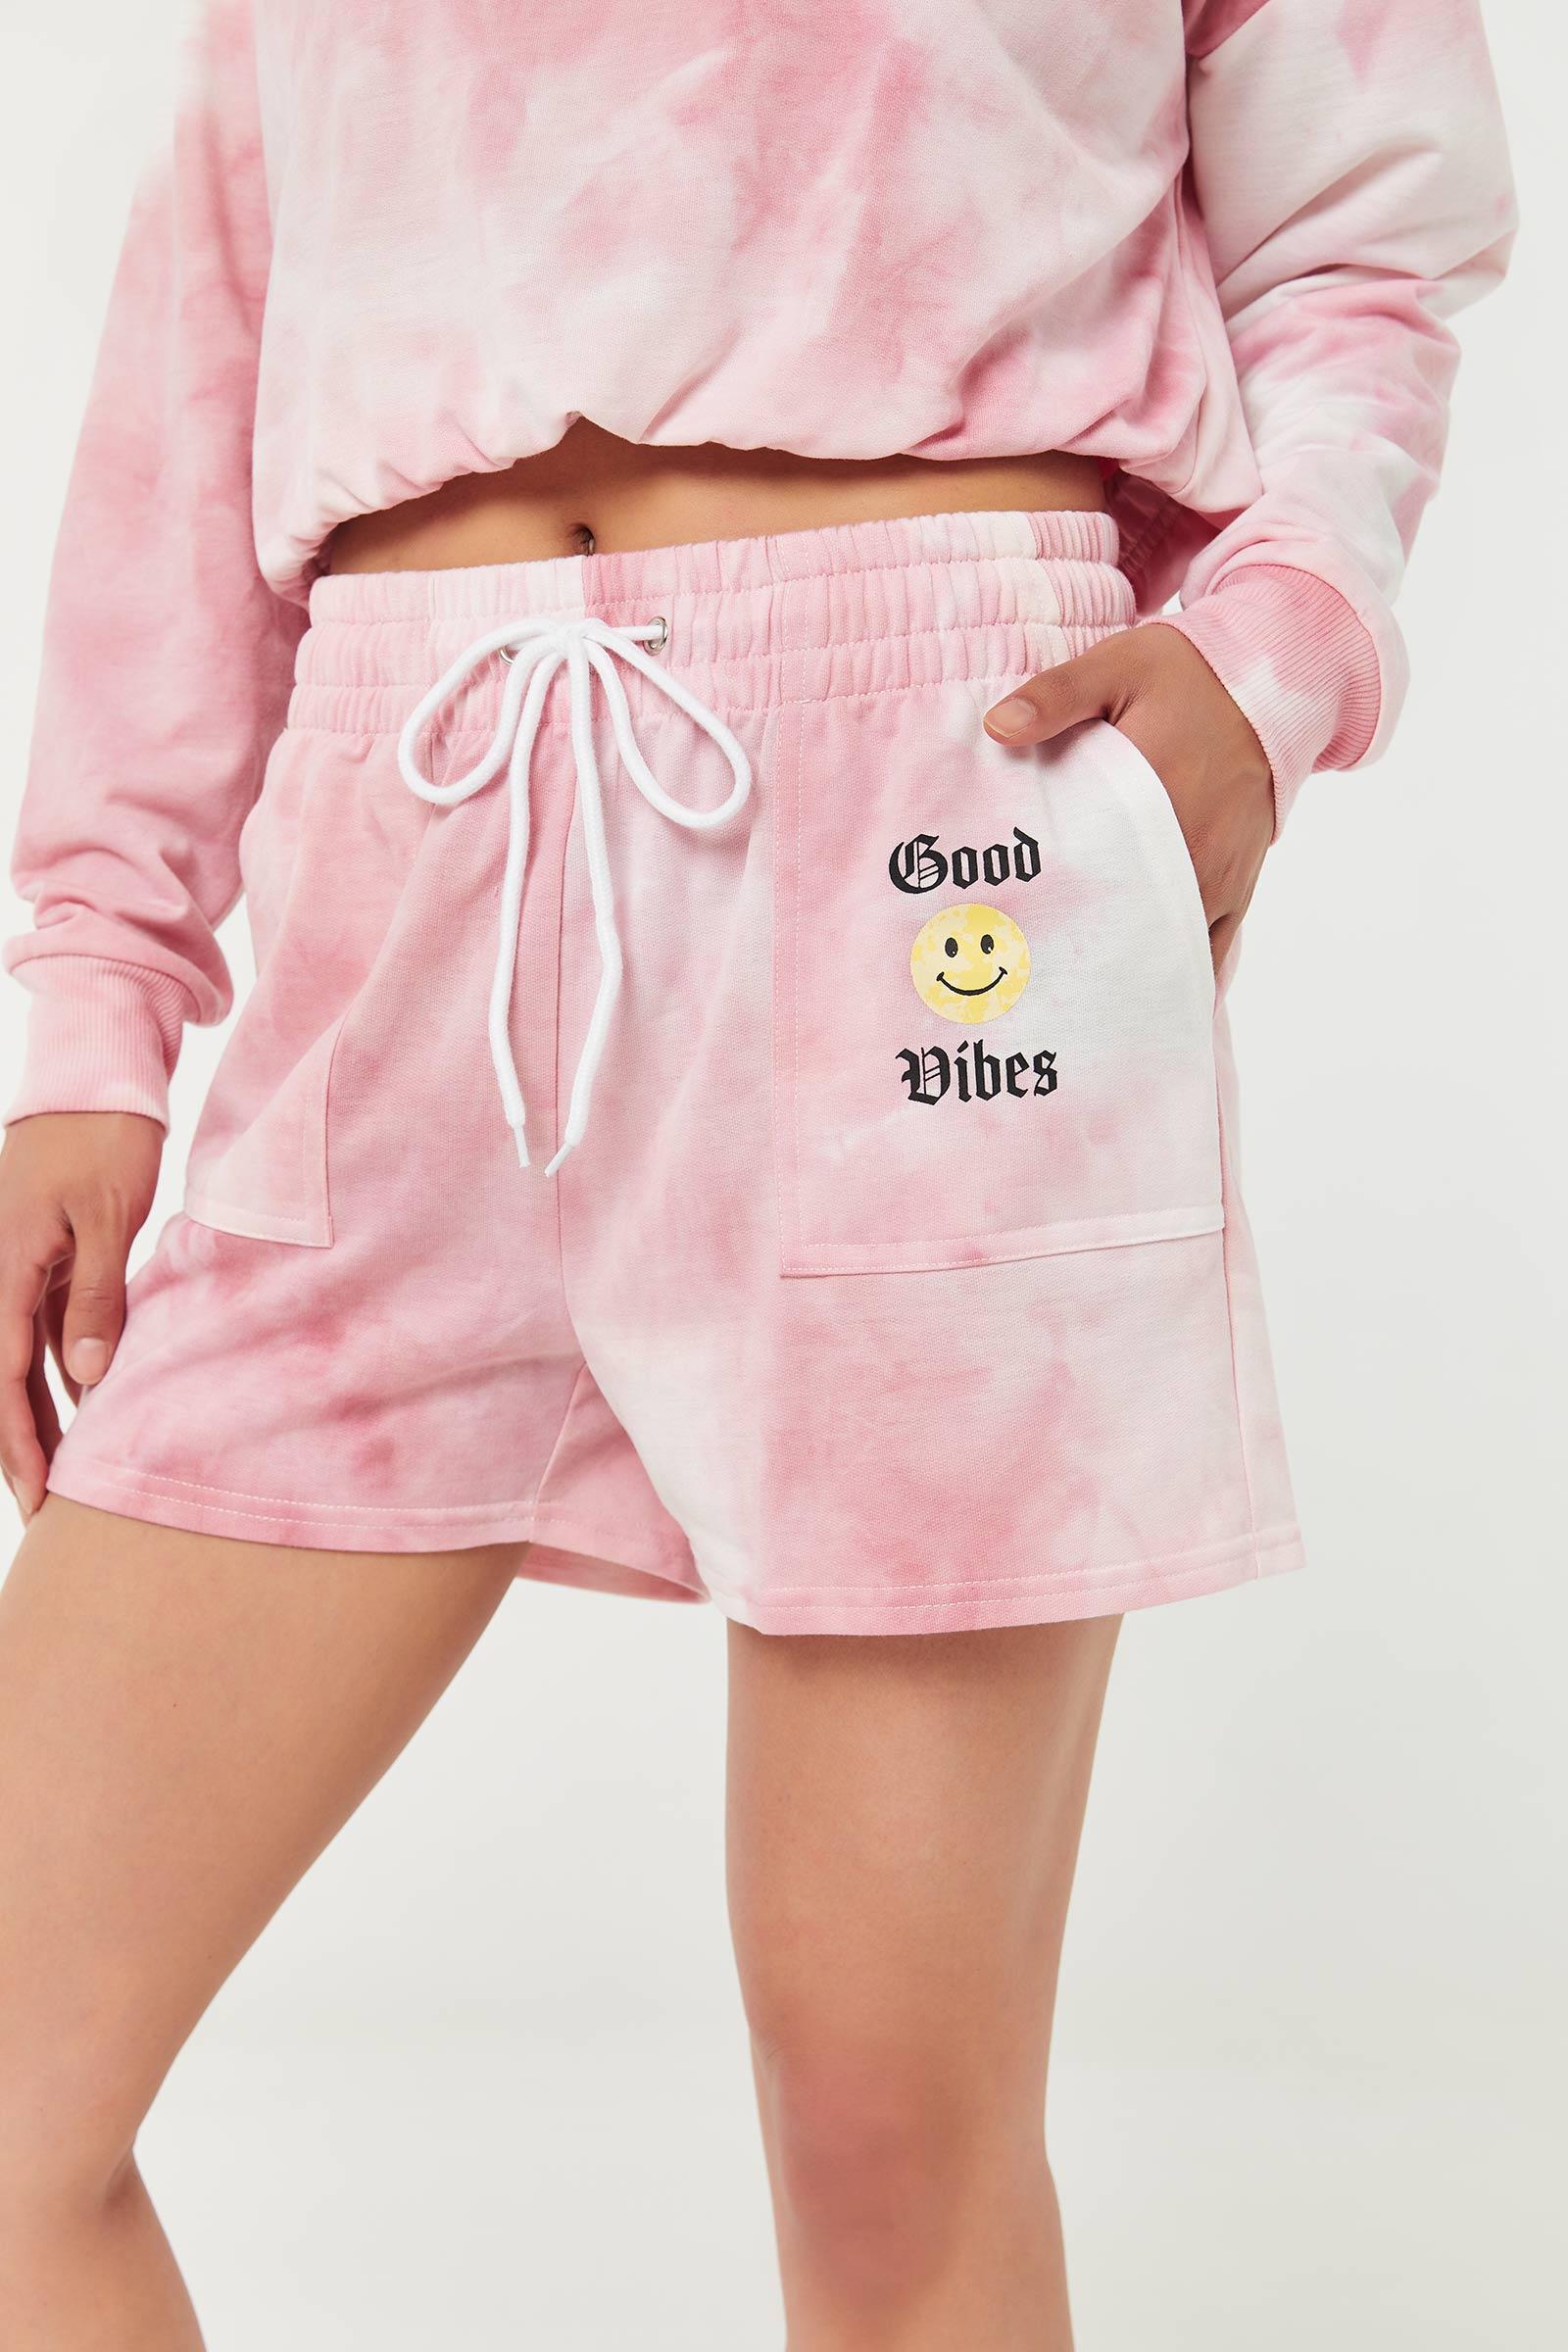 Good Vibes Shorts